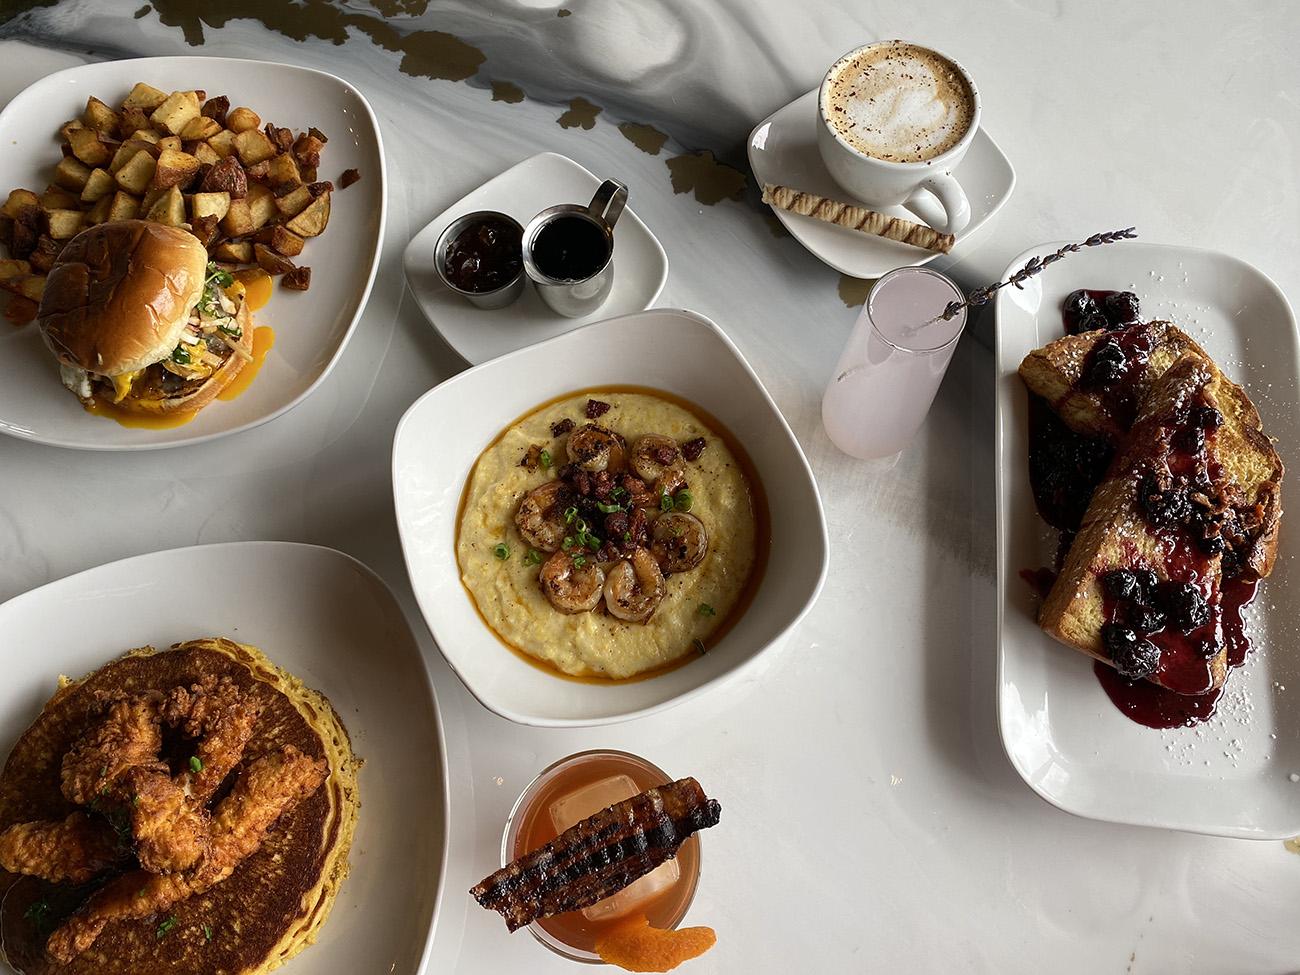 Brunch restaurant Easy Like Sunday opens on February 13 in the Park Road area